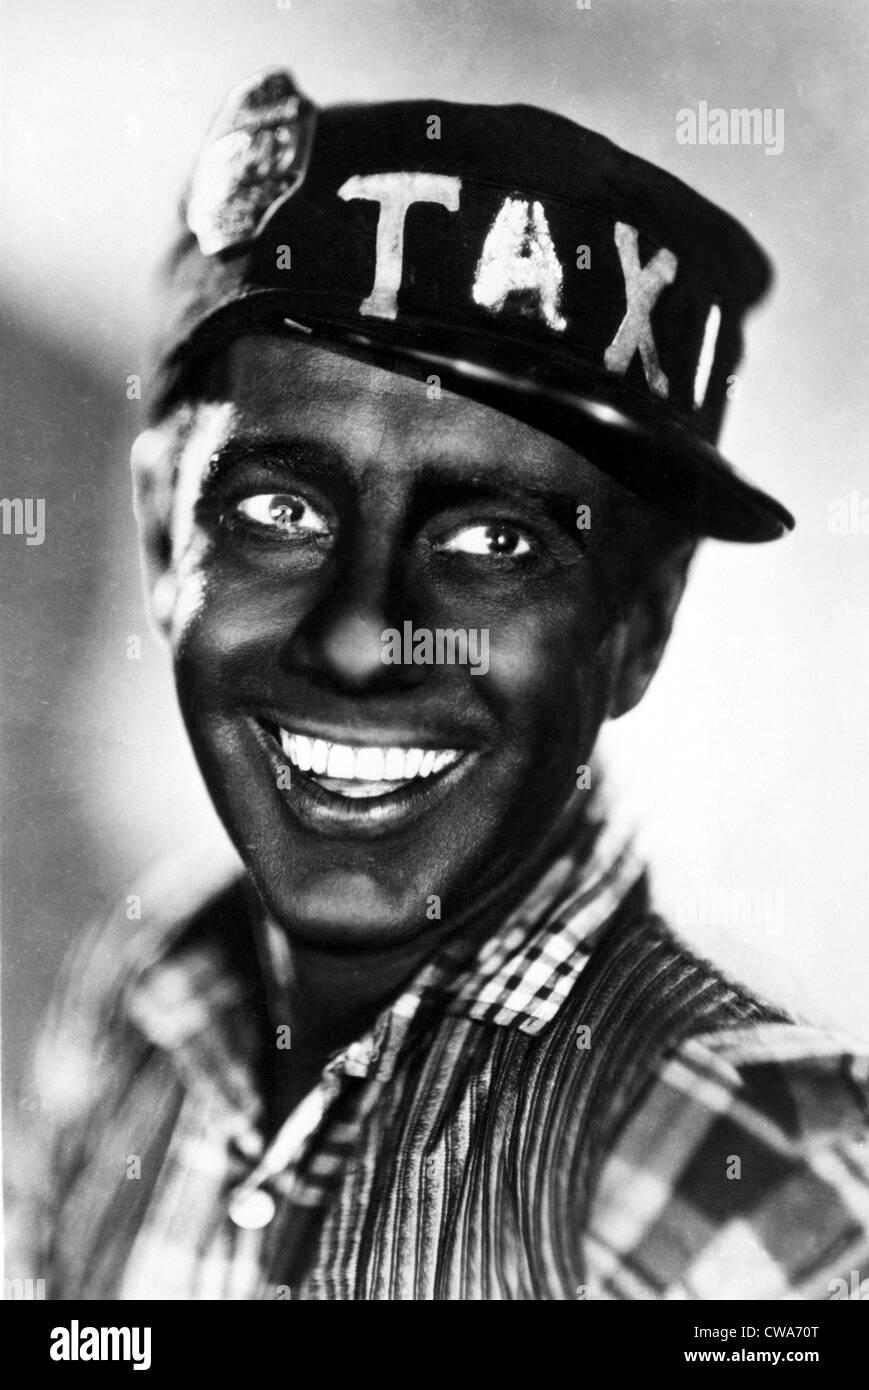 Freeman Gosden as Amos of AMOS 'N' ANDY, circa 1930. Courtesy: CSU Archives / Everett Collection - Stock Image